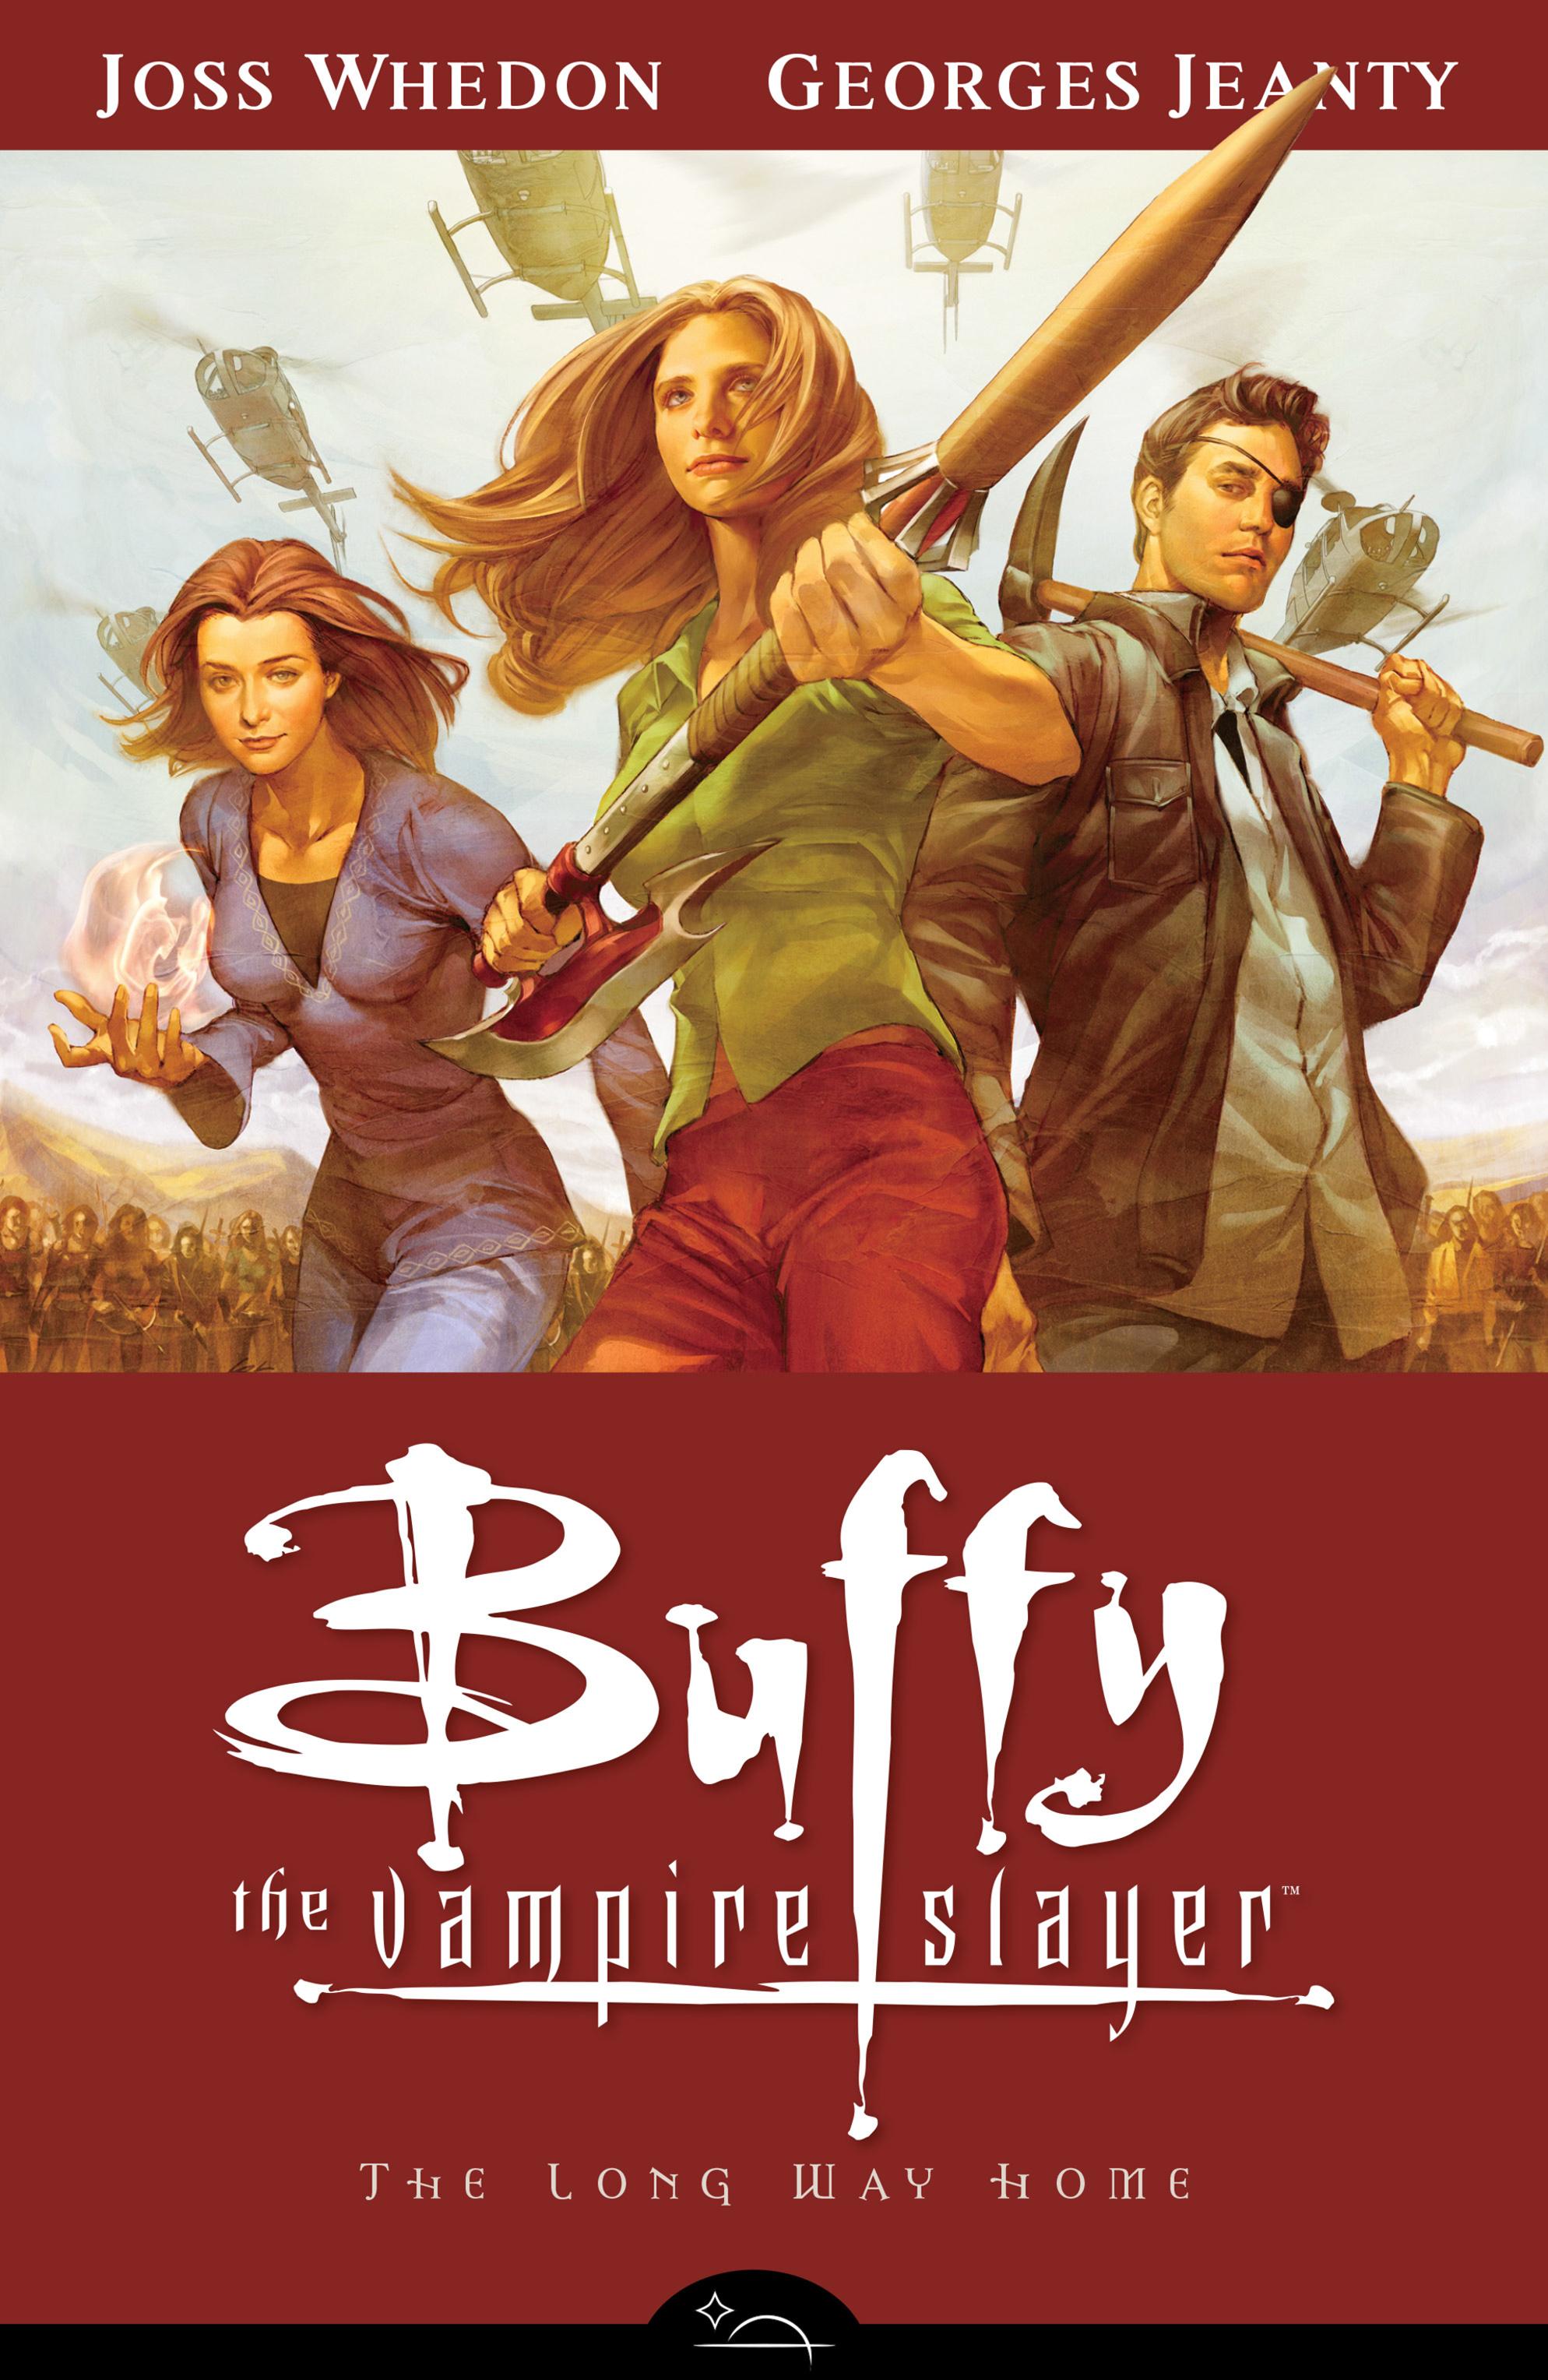 Buffy the Vampire Slayer Season Eight _TPB_1_-_The_Long_Way_Home Page 1